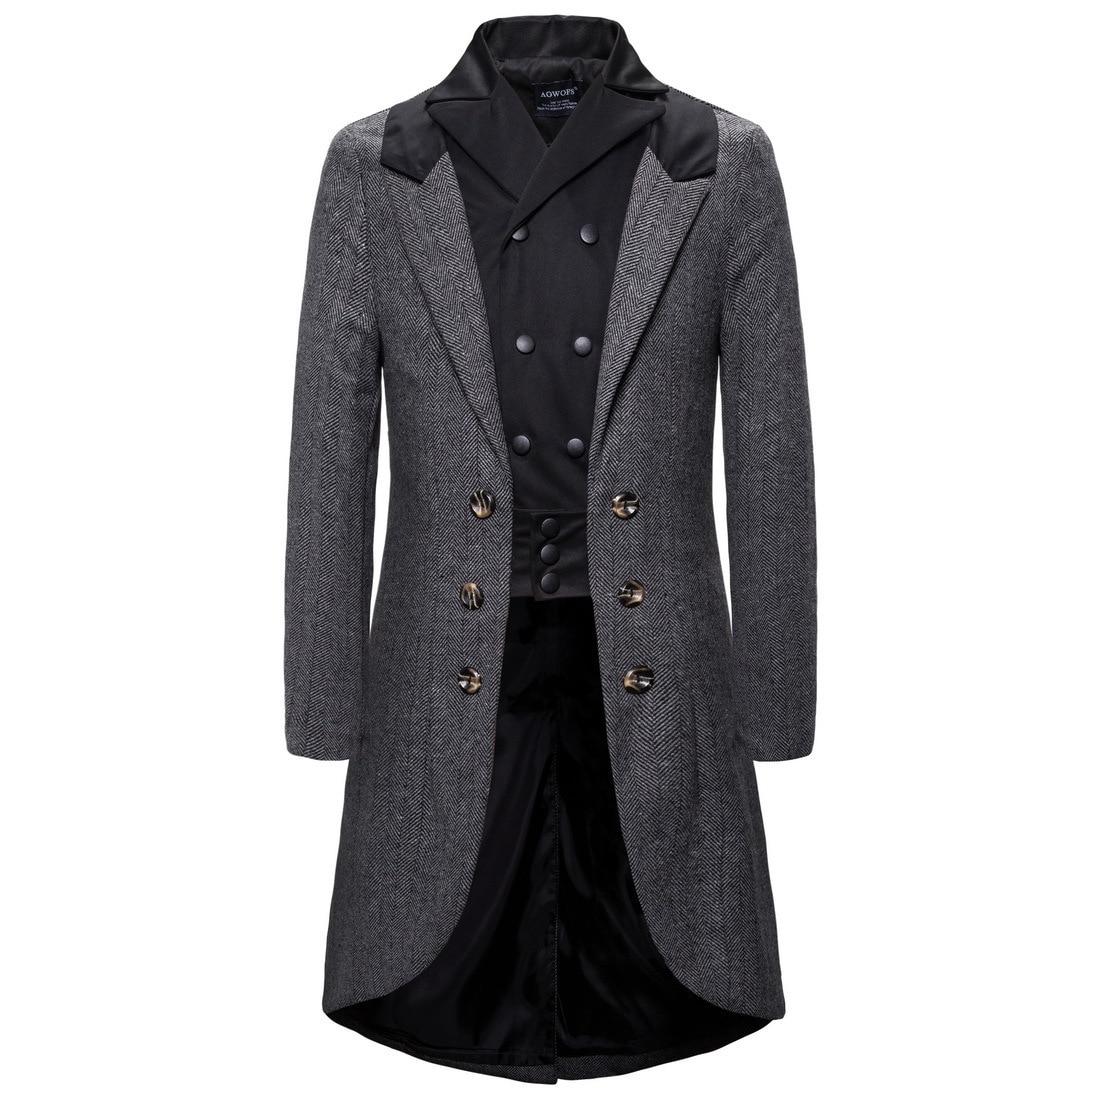 Men's new business personality long style windbreaker jacket evening dress gentleman casual European size XXL